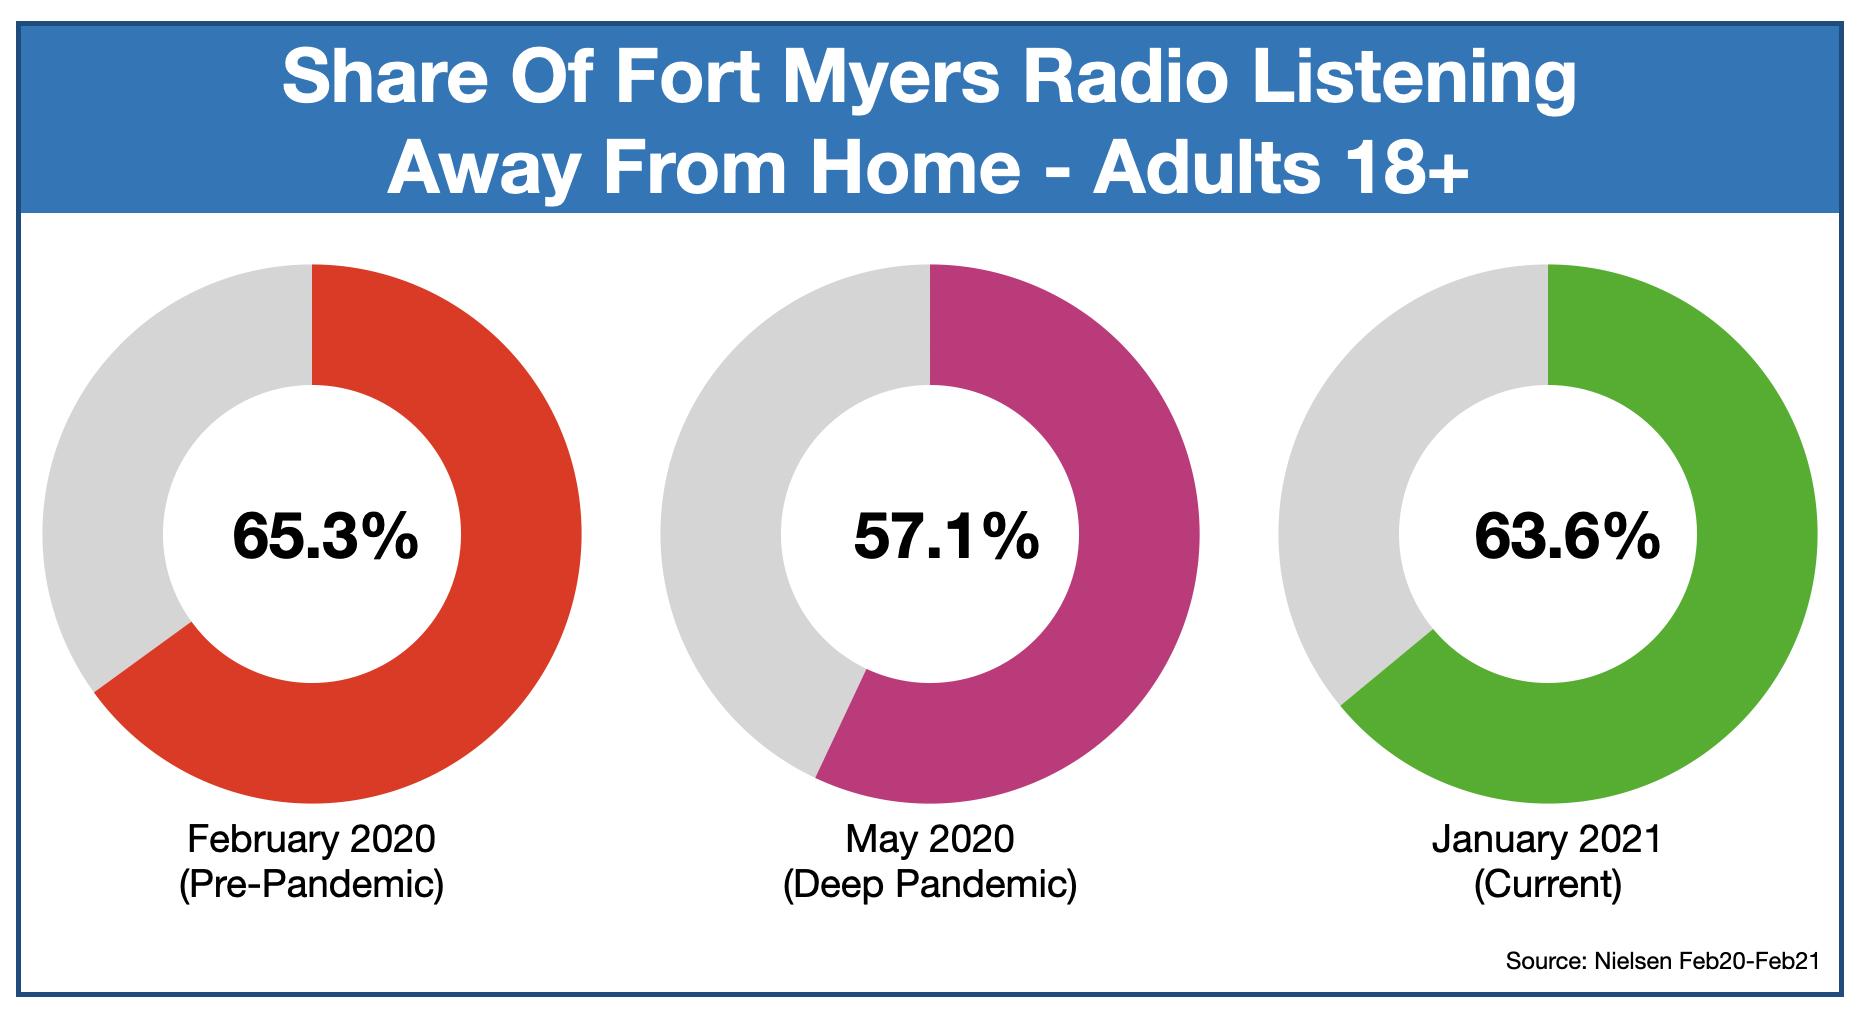 Advertising On Fort Myers Radio: Listening locations